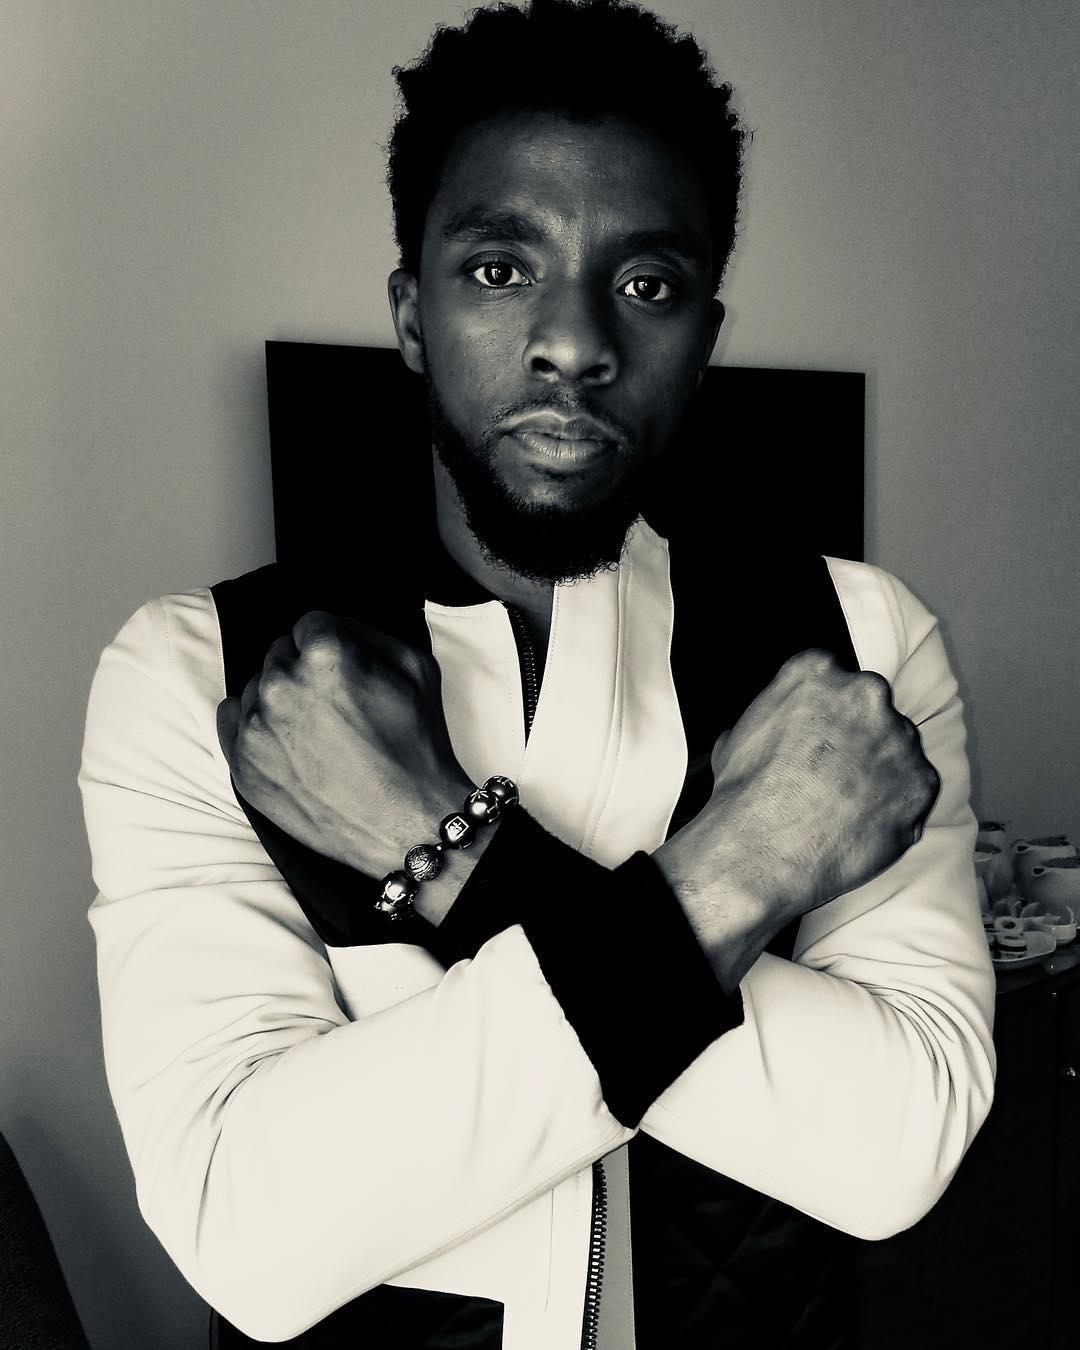 Chadwick Boseman Surprises Fans On The Tonight Show